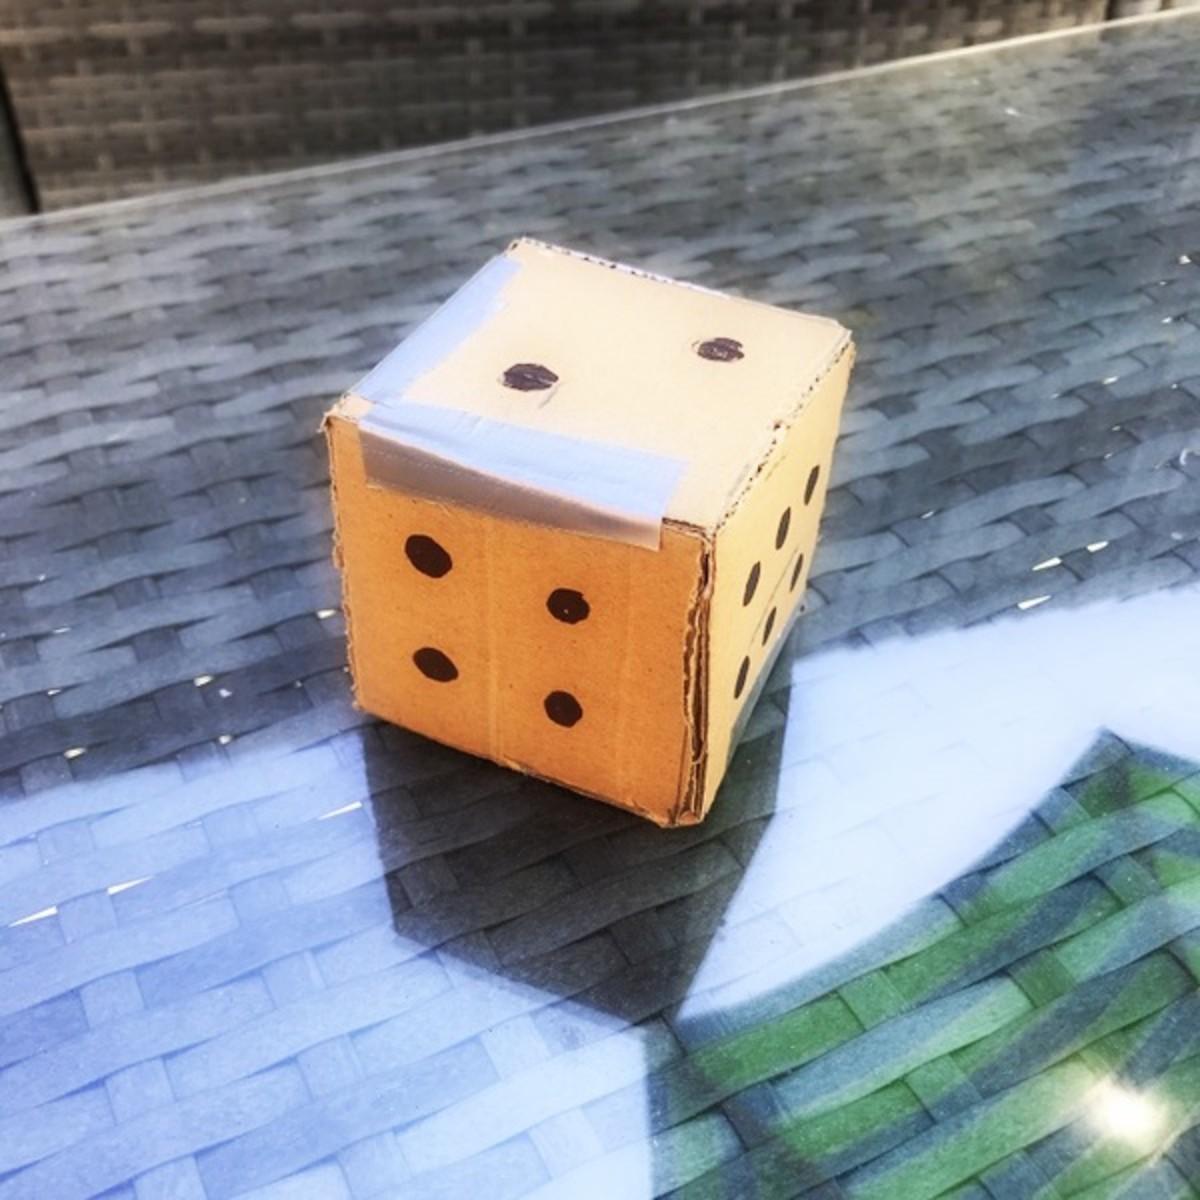 Cardboard dice using household materials